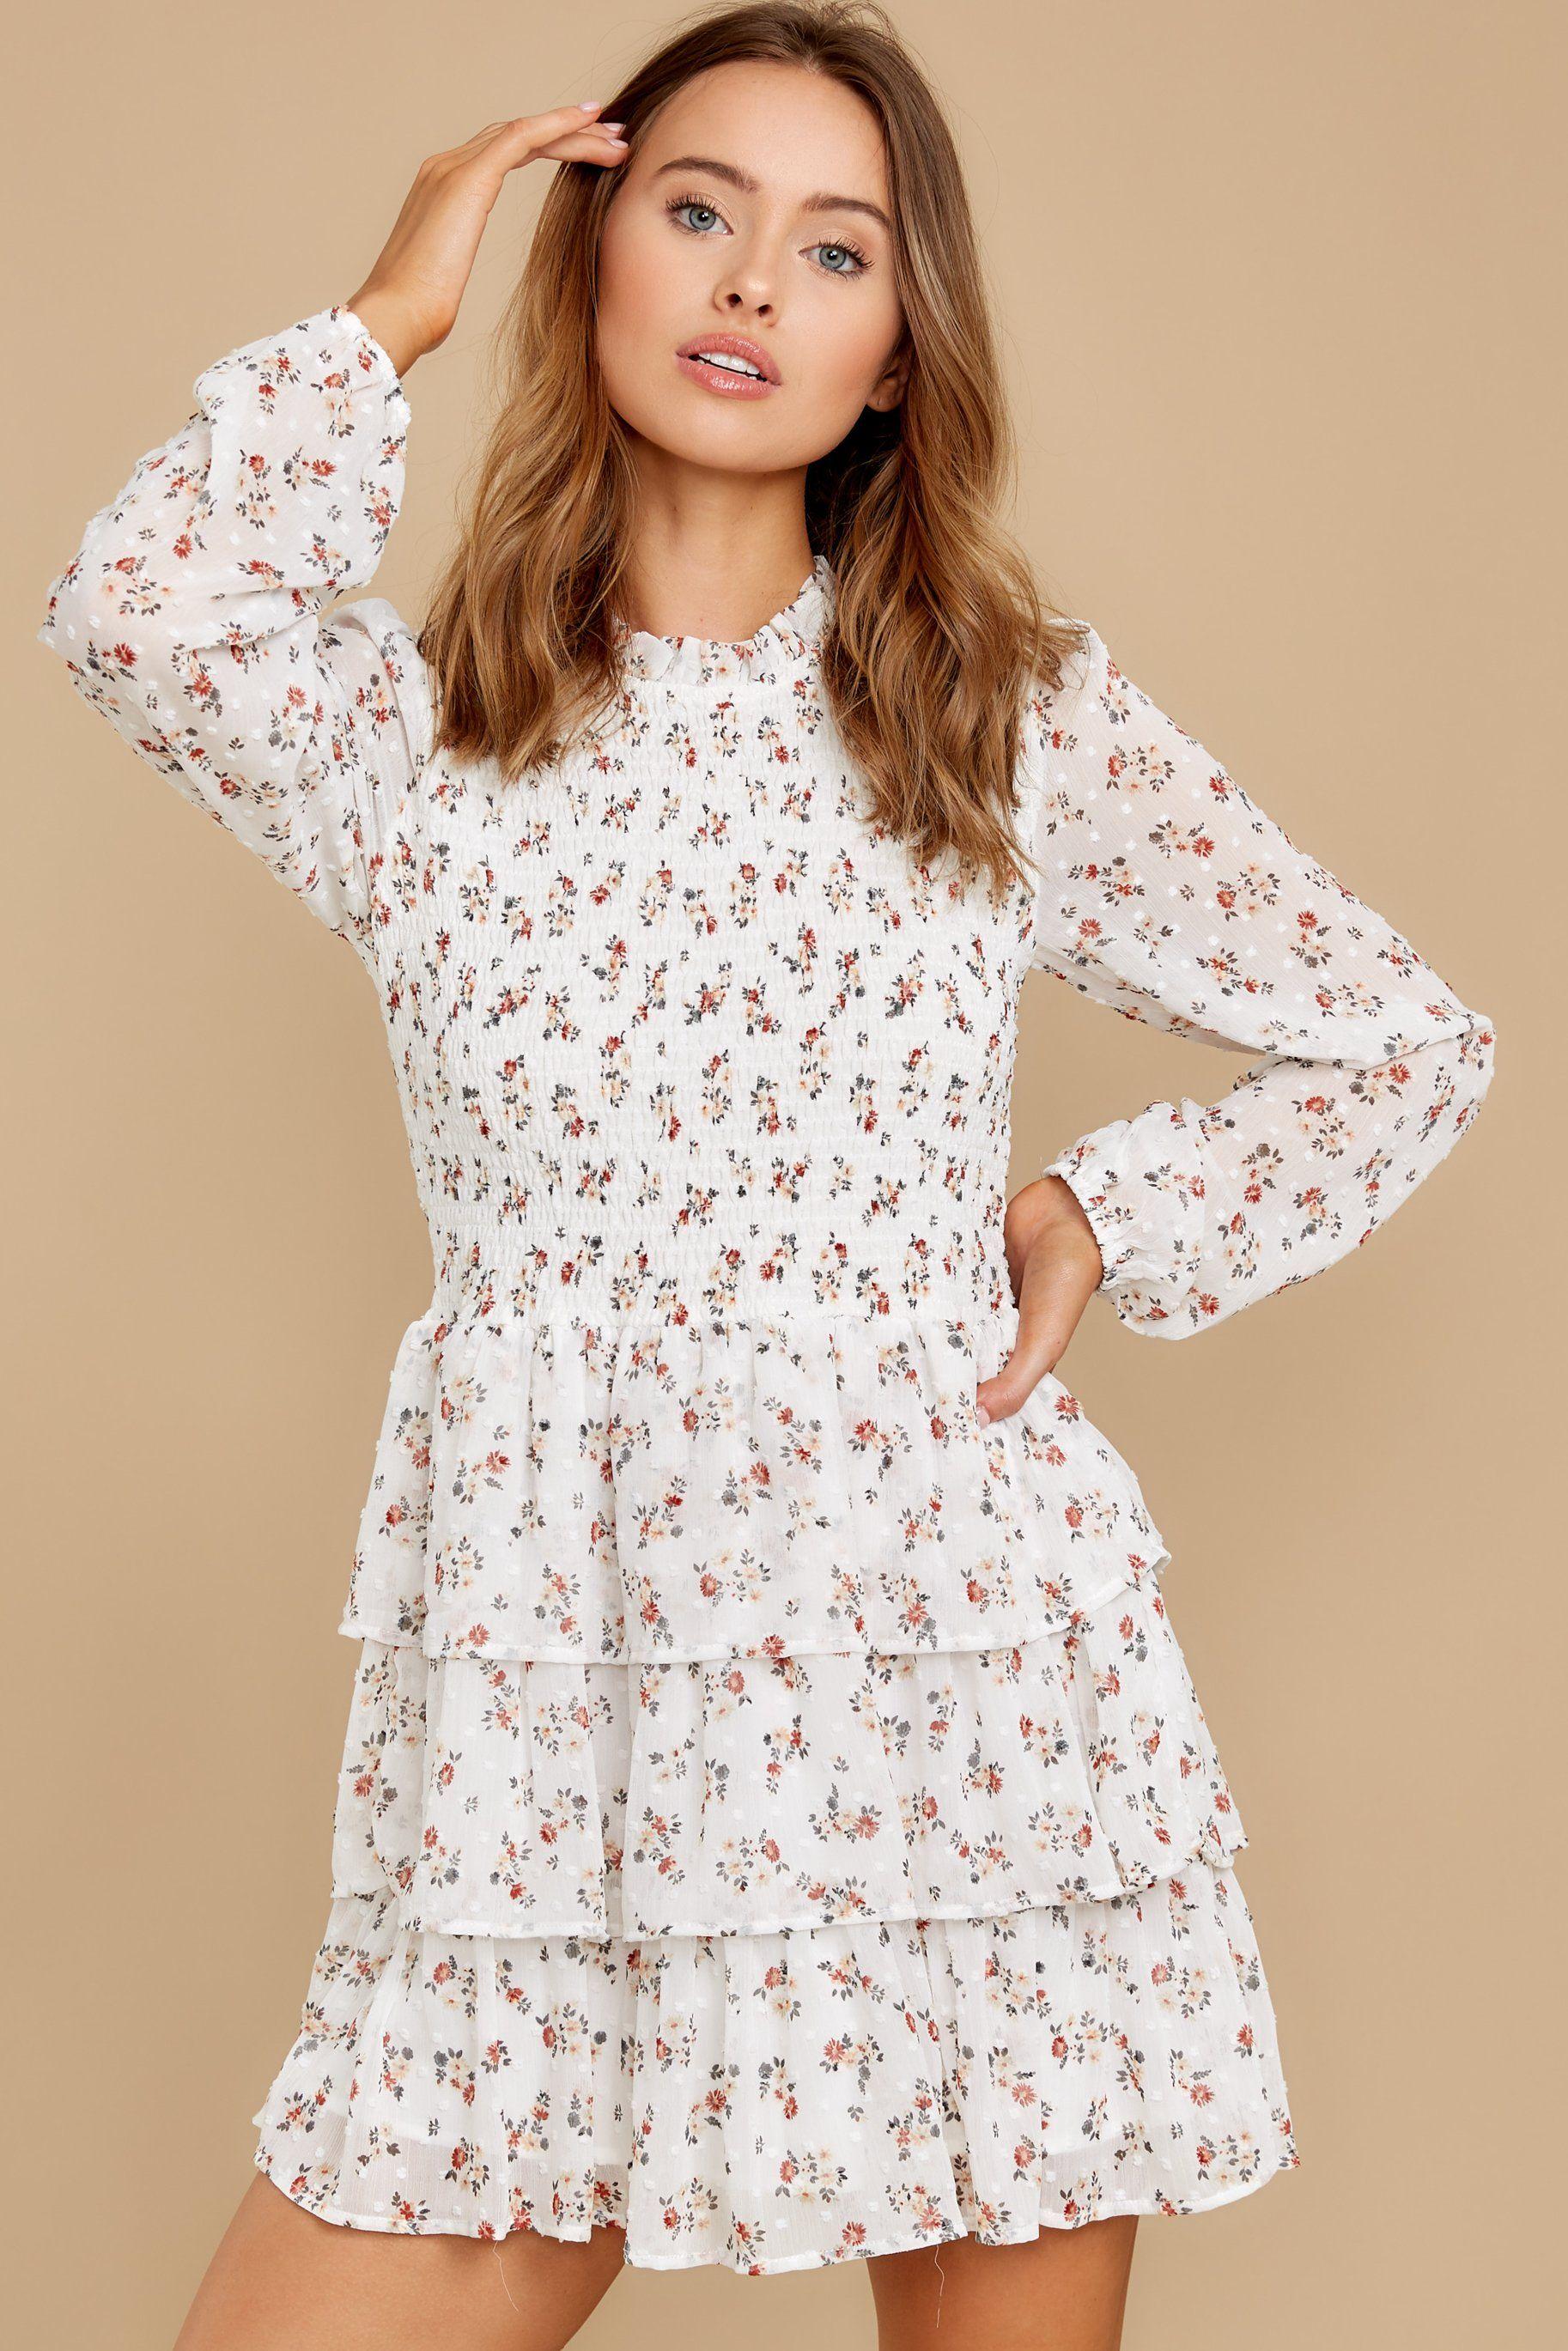 23+ Print dress ideas